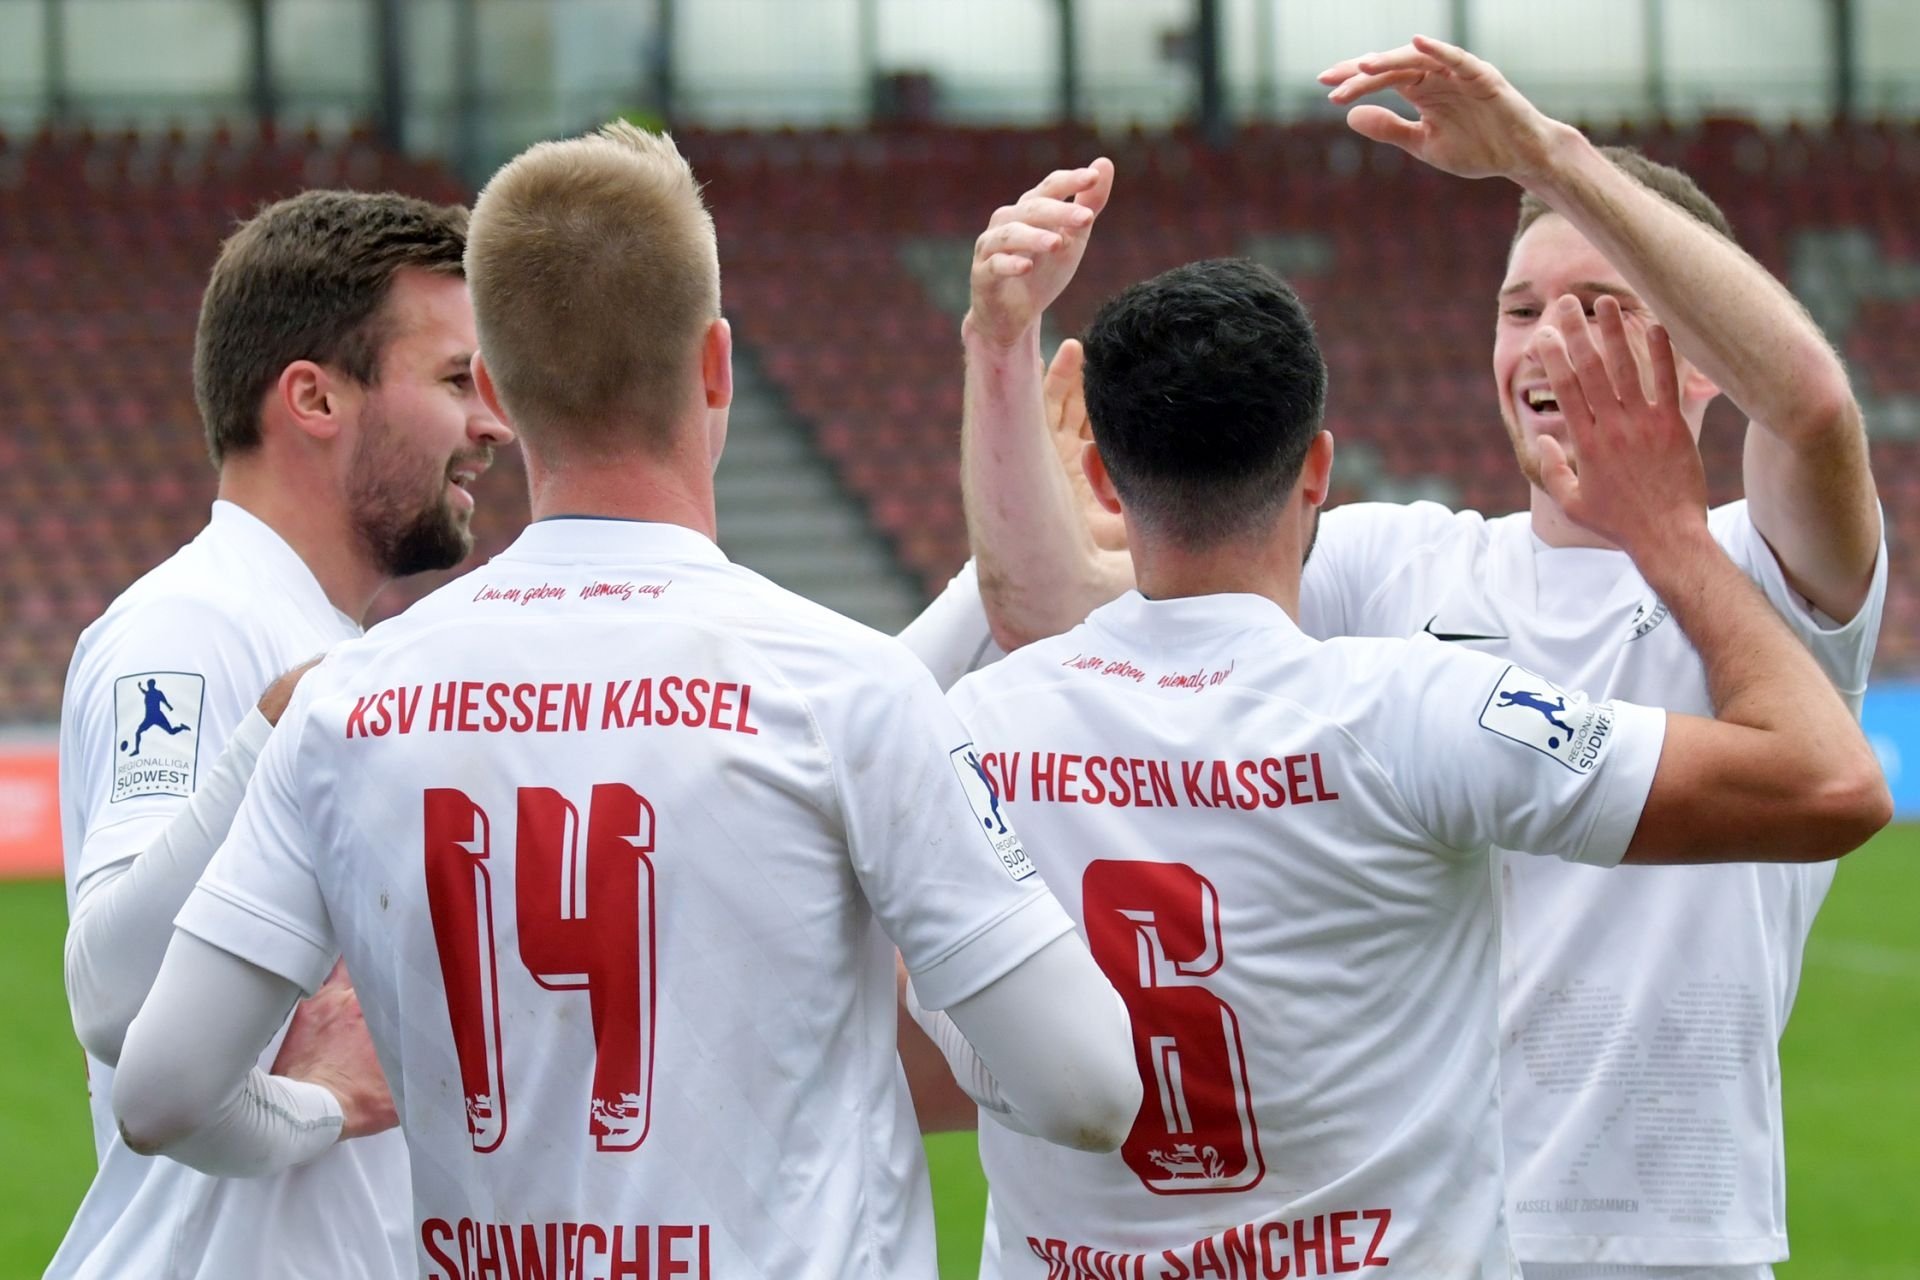 Regionalliga S�dwest 2020/21, KSV Hessen Kassel, 1. FSV Mainz 05 II, Endstand 2:1, Jubel zum 2:0